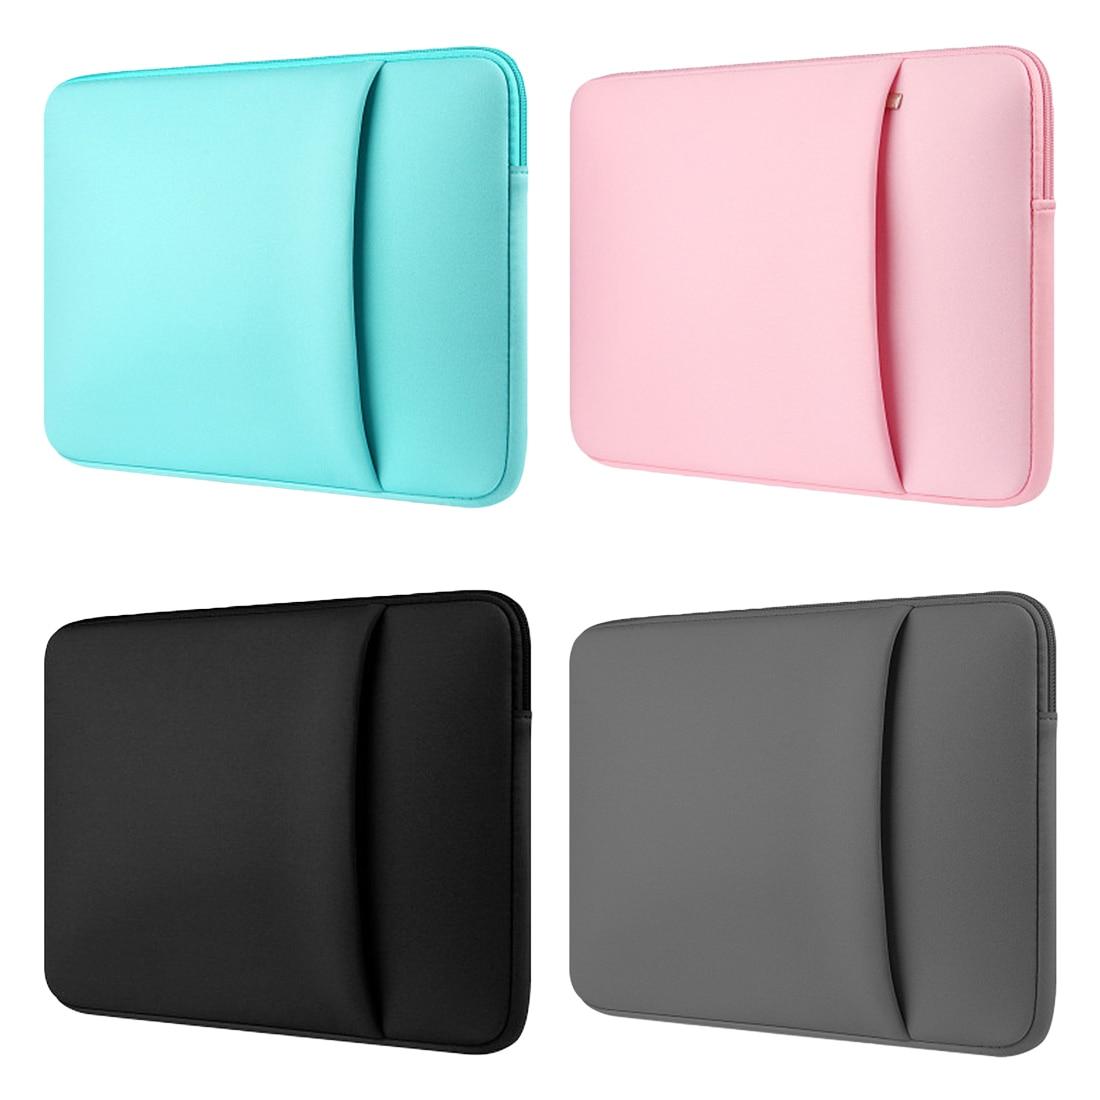 Bolsa Para Laptop Manga Notebook Para Macbook Air 13 Pro 11 12 15 15.6 Casos Bolsa Para Laptop 11 13 14 15 polegada Estojo protetor Forro Sacos